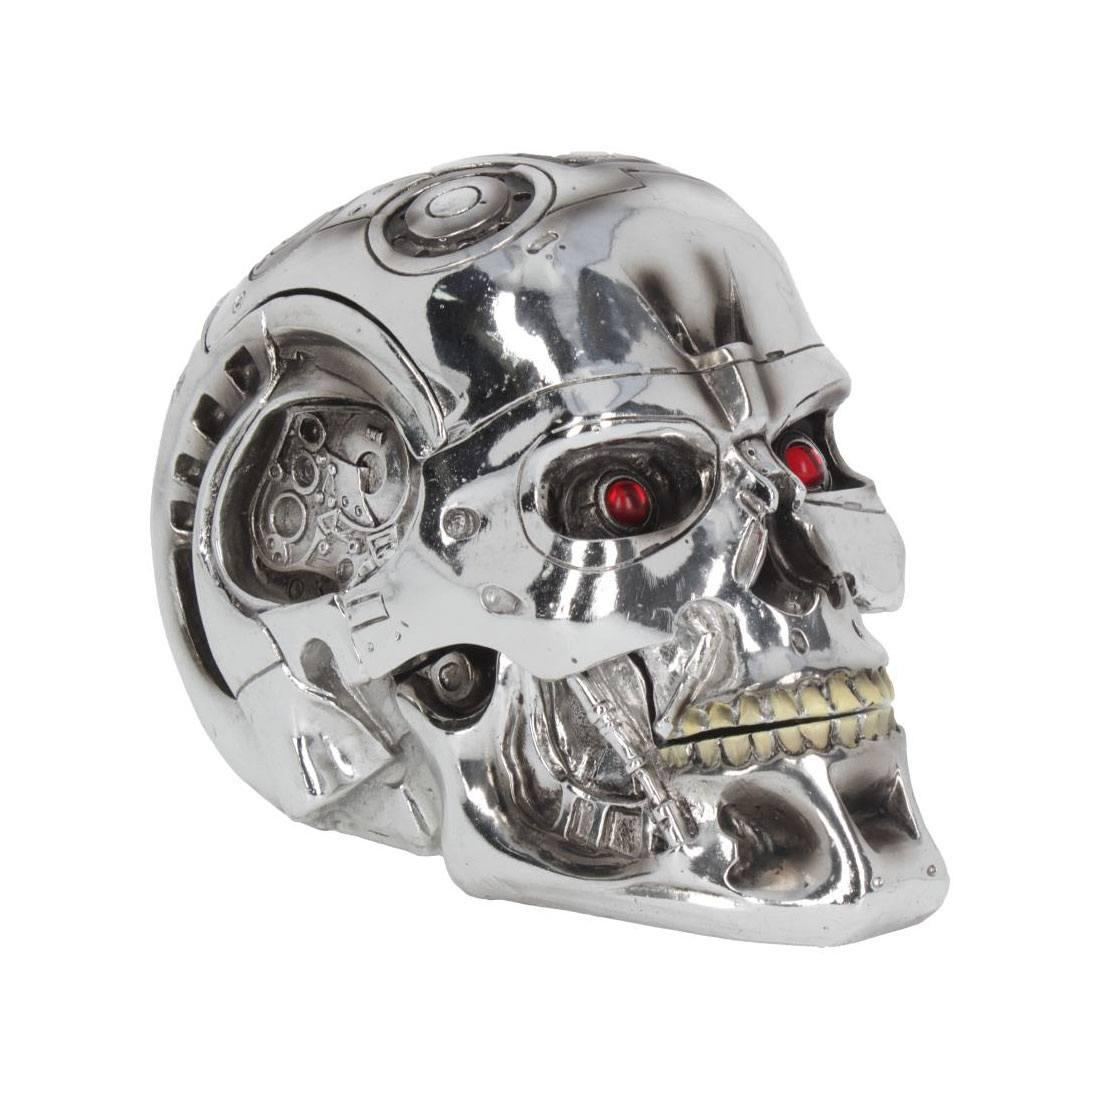 Terminator boite de rangement t 800 1